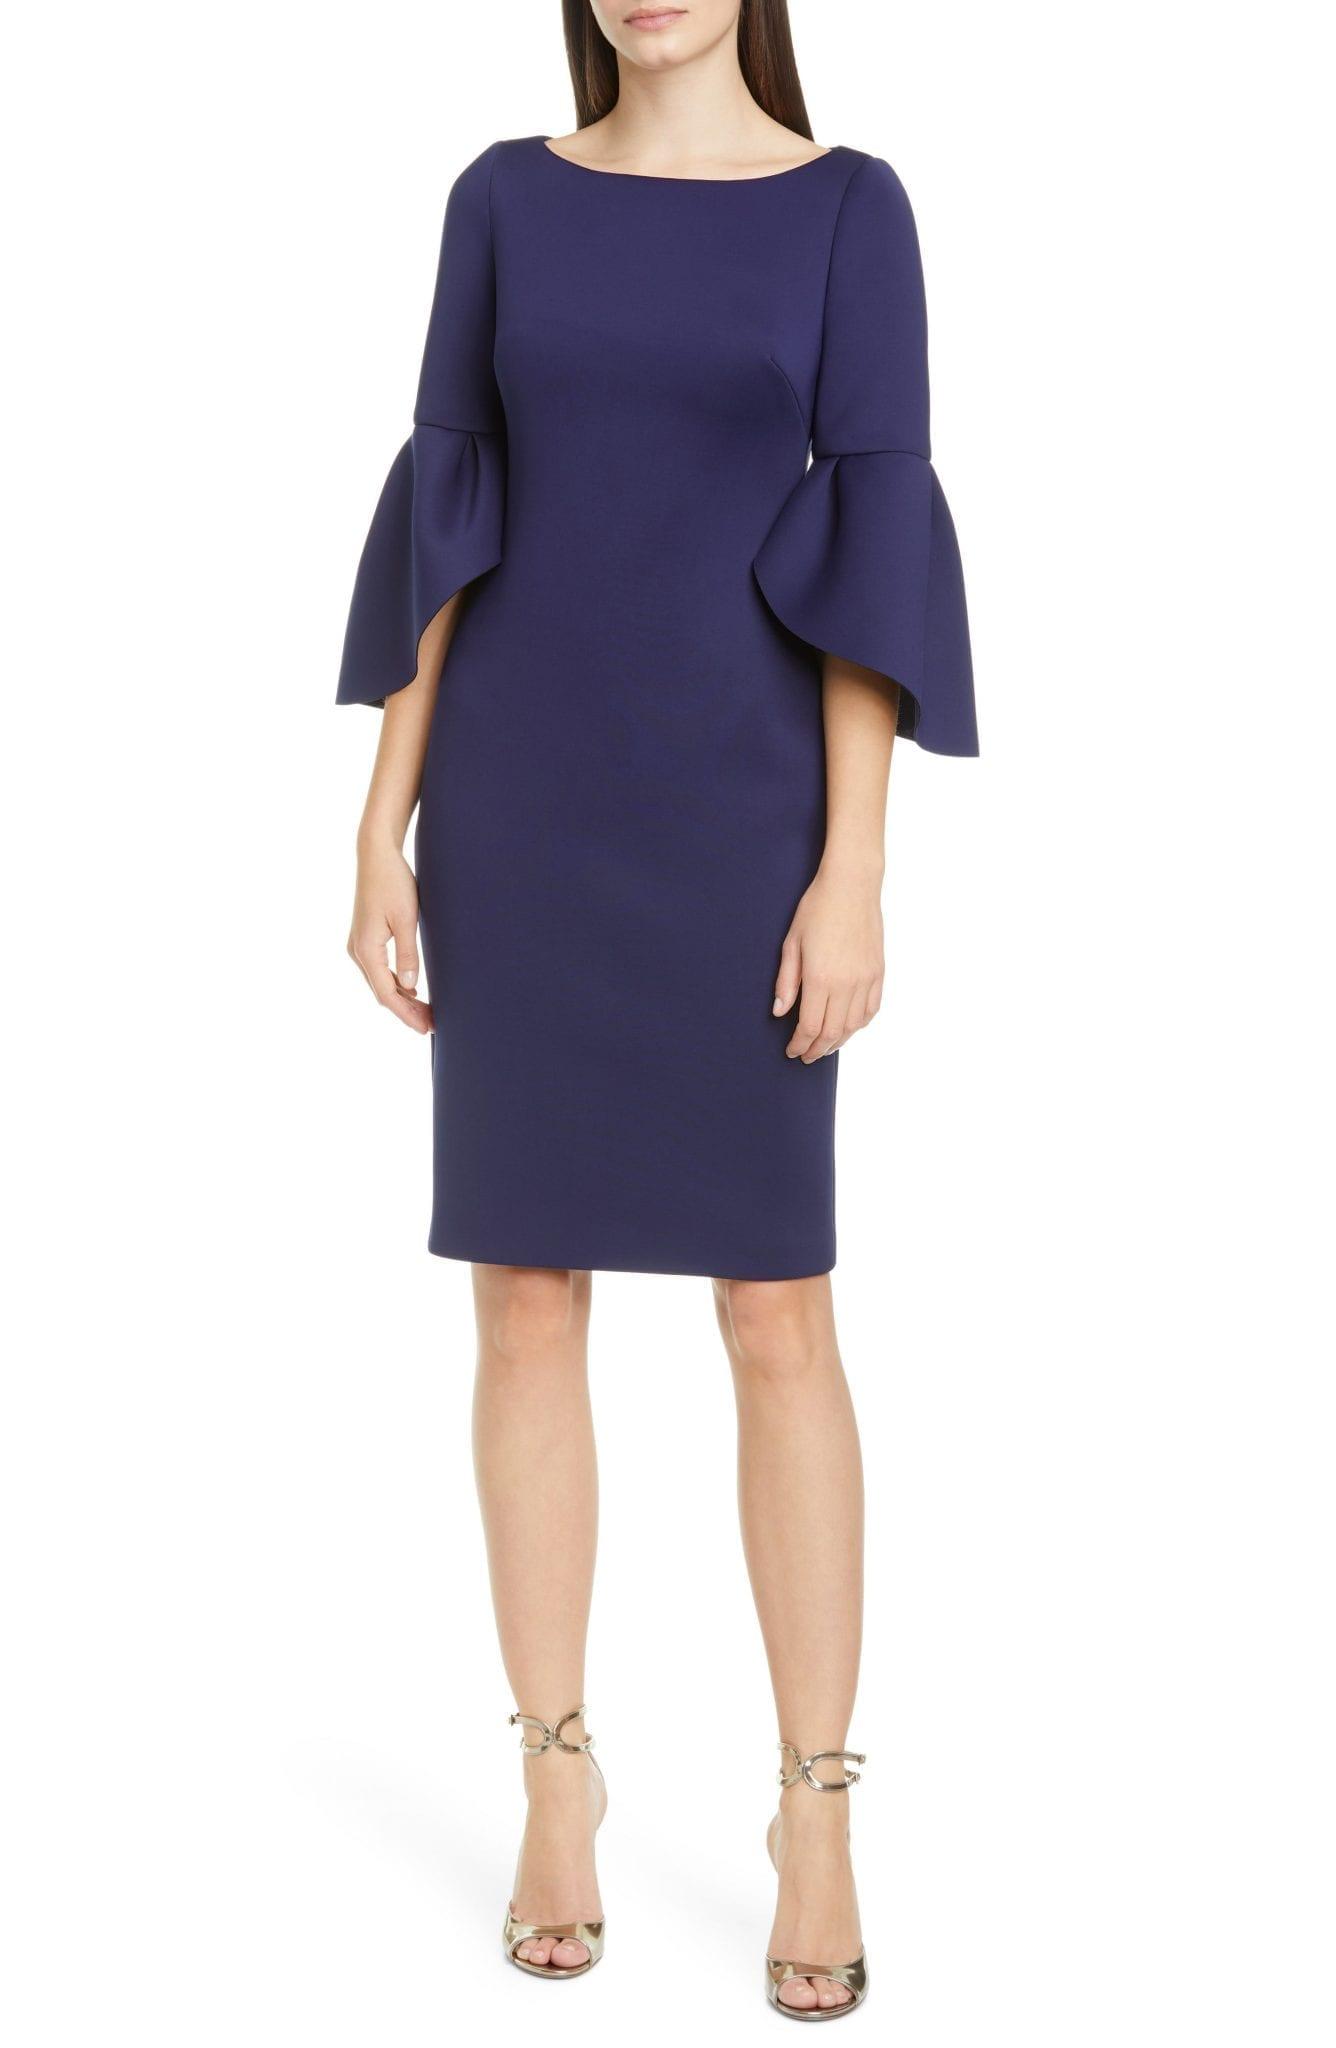 BADGLEY MISCHKA COLLECTION Badgley Mischka Tulip Sleeve Cocktail Dress